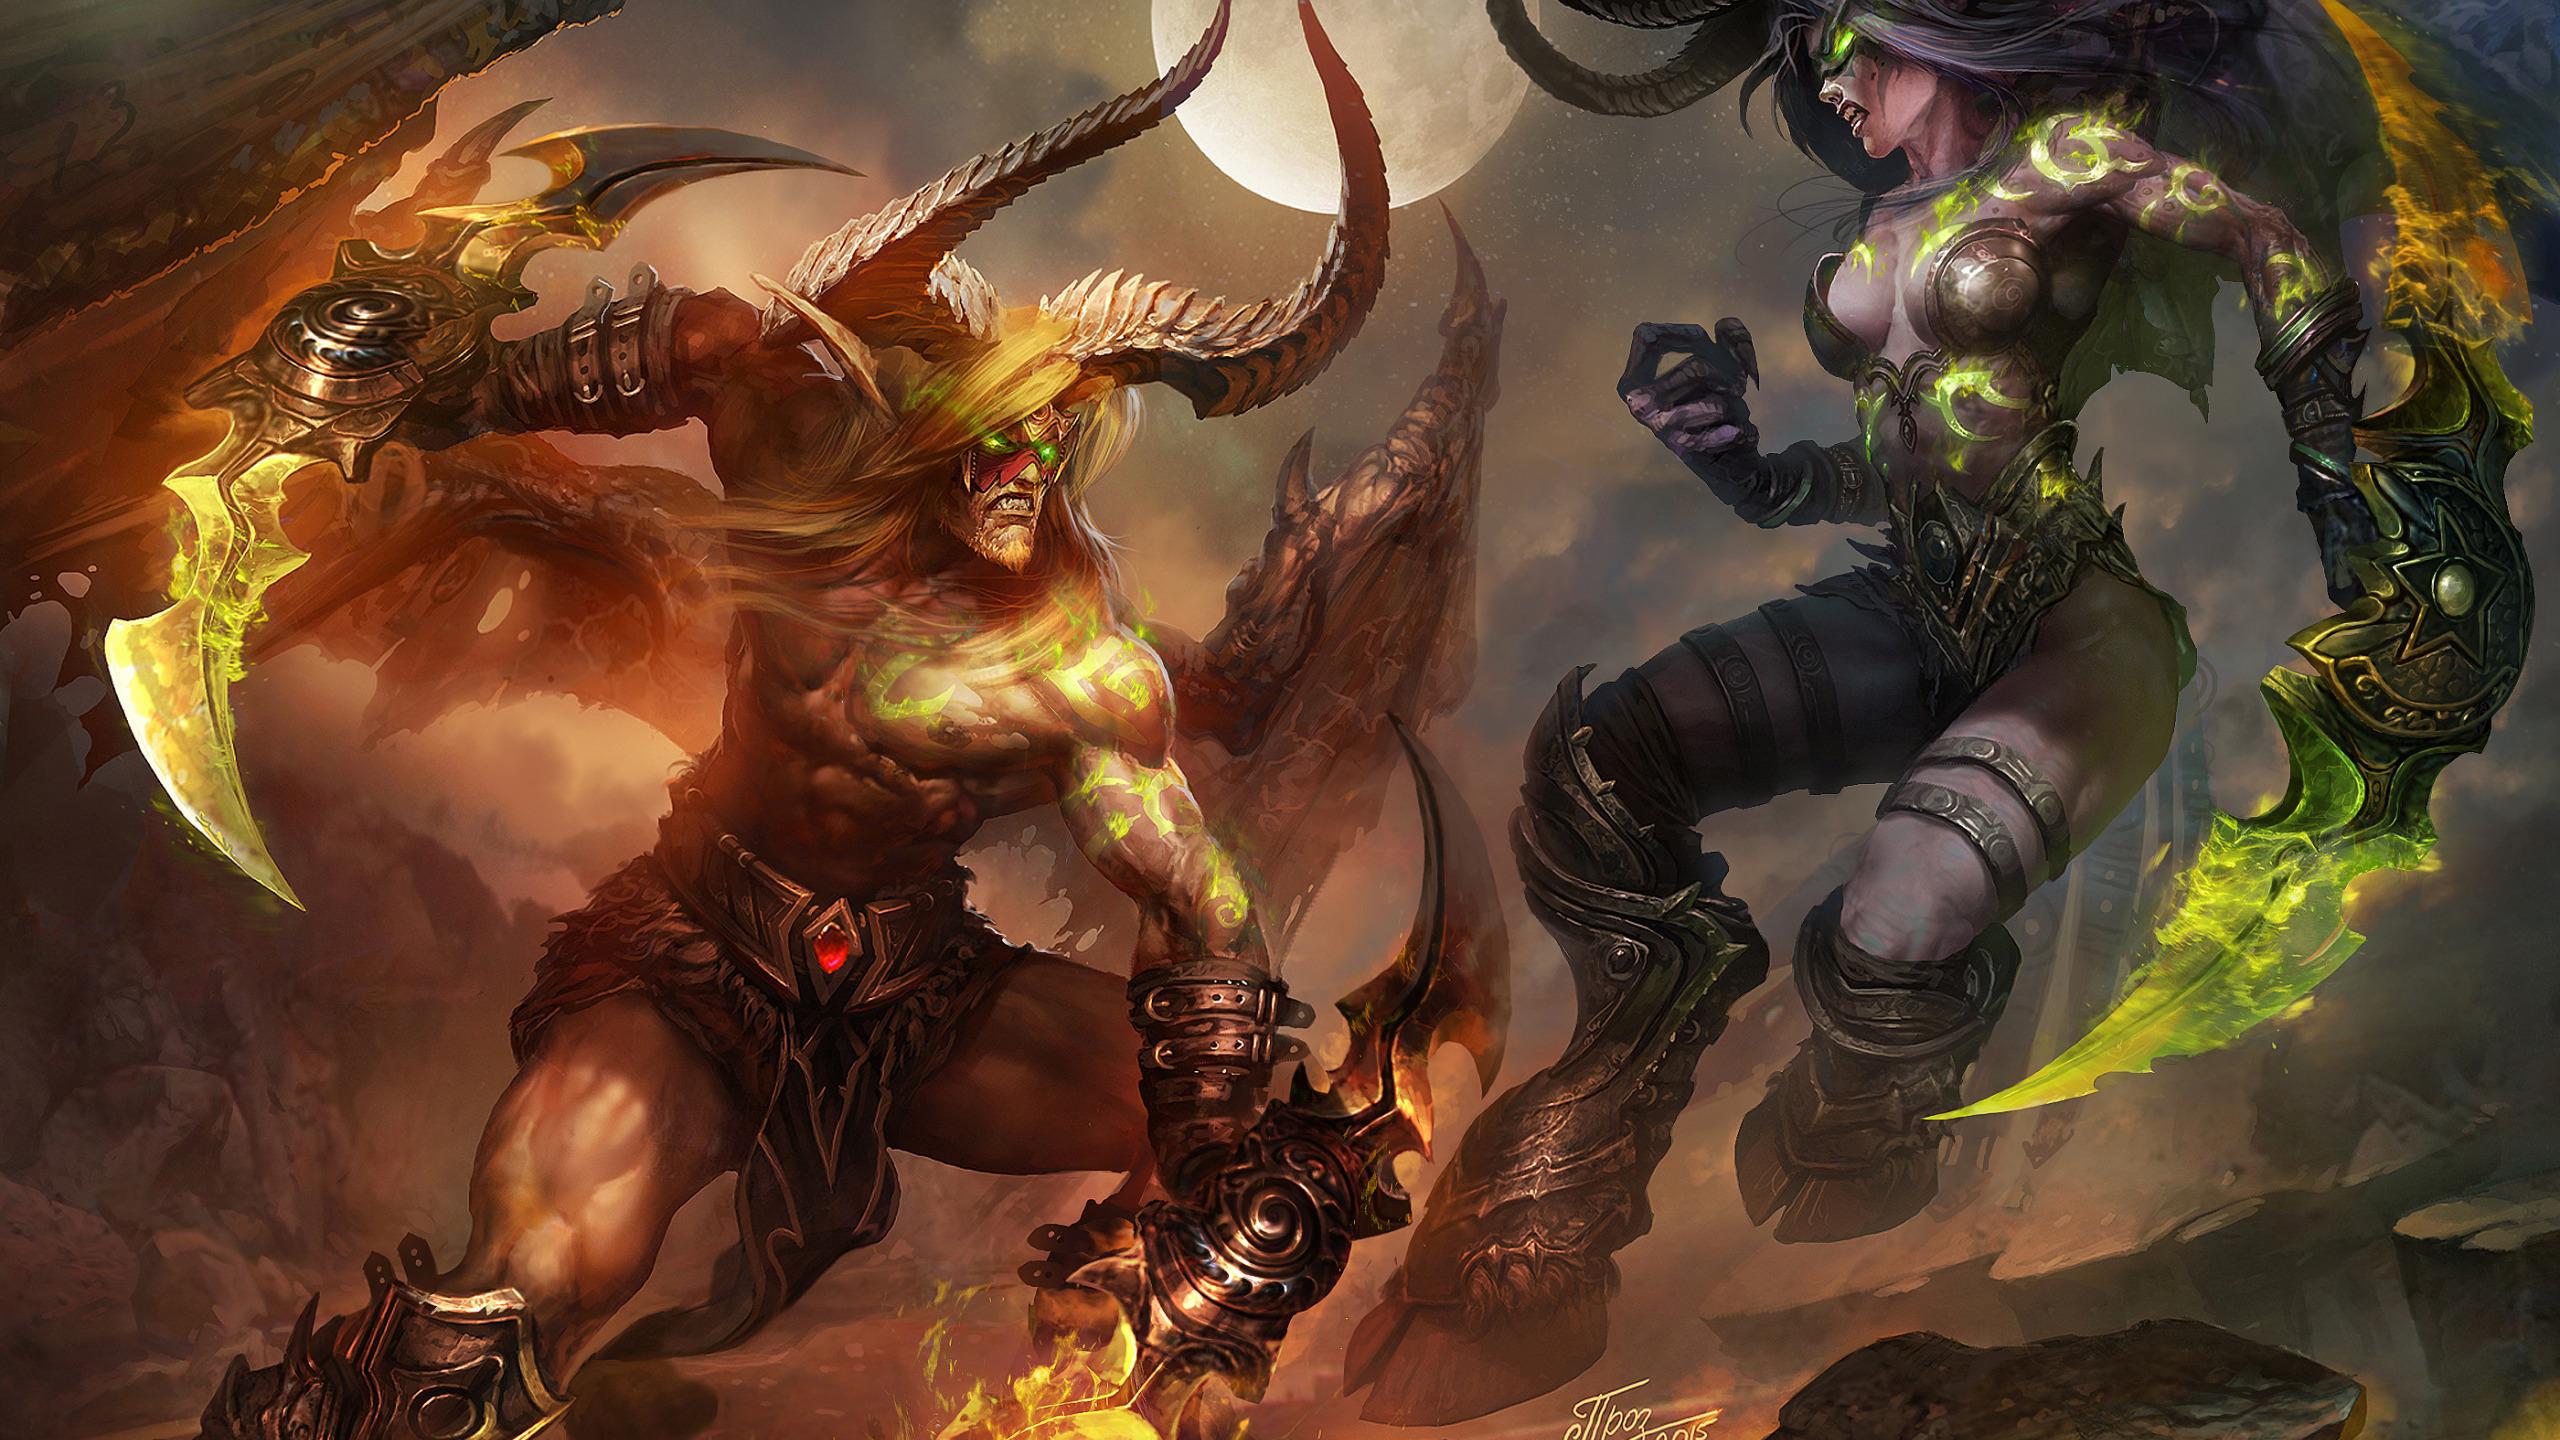 Download Wallpaper Night Elf Battle The Demon Fight Warcraft